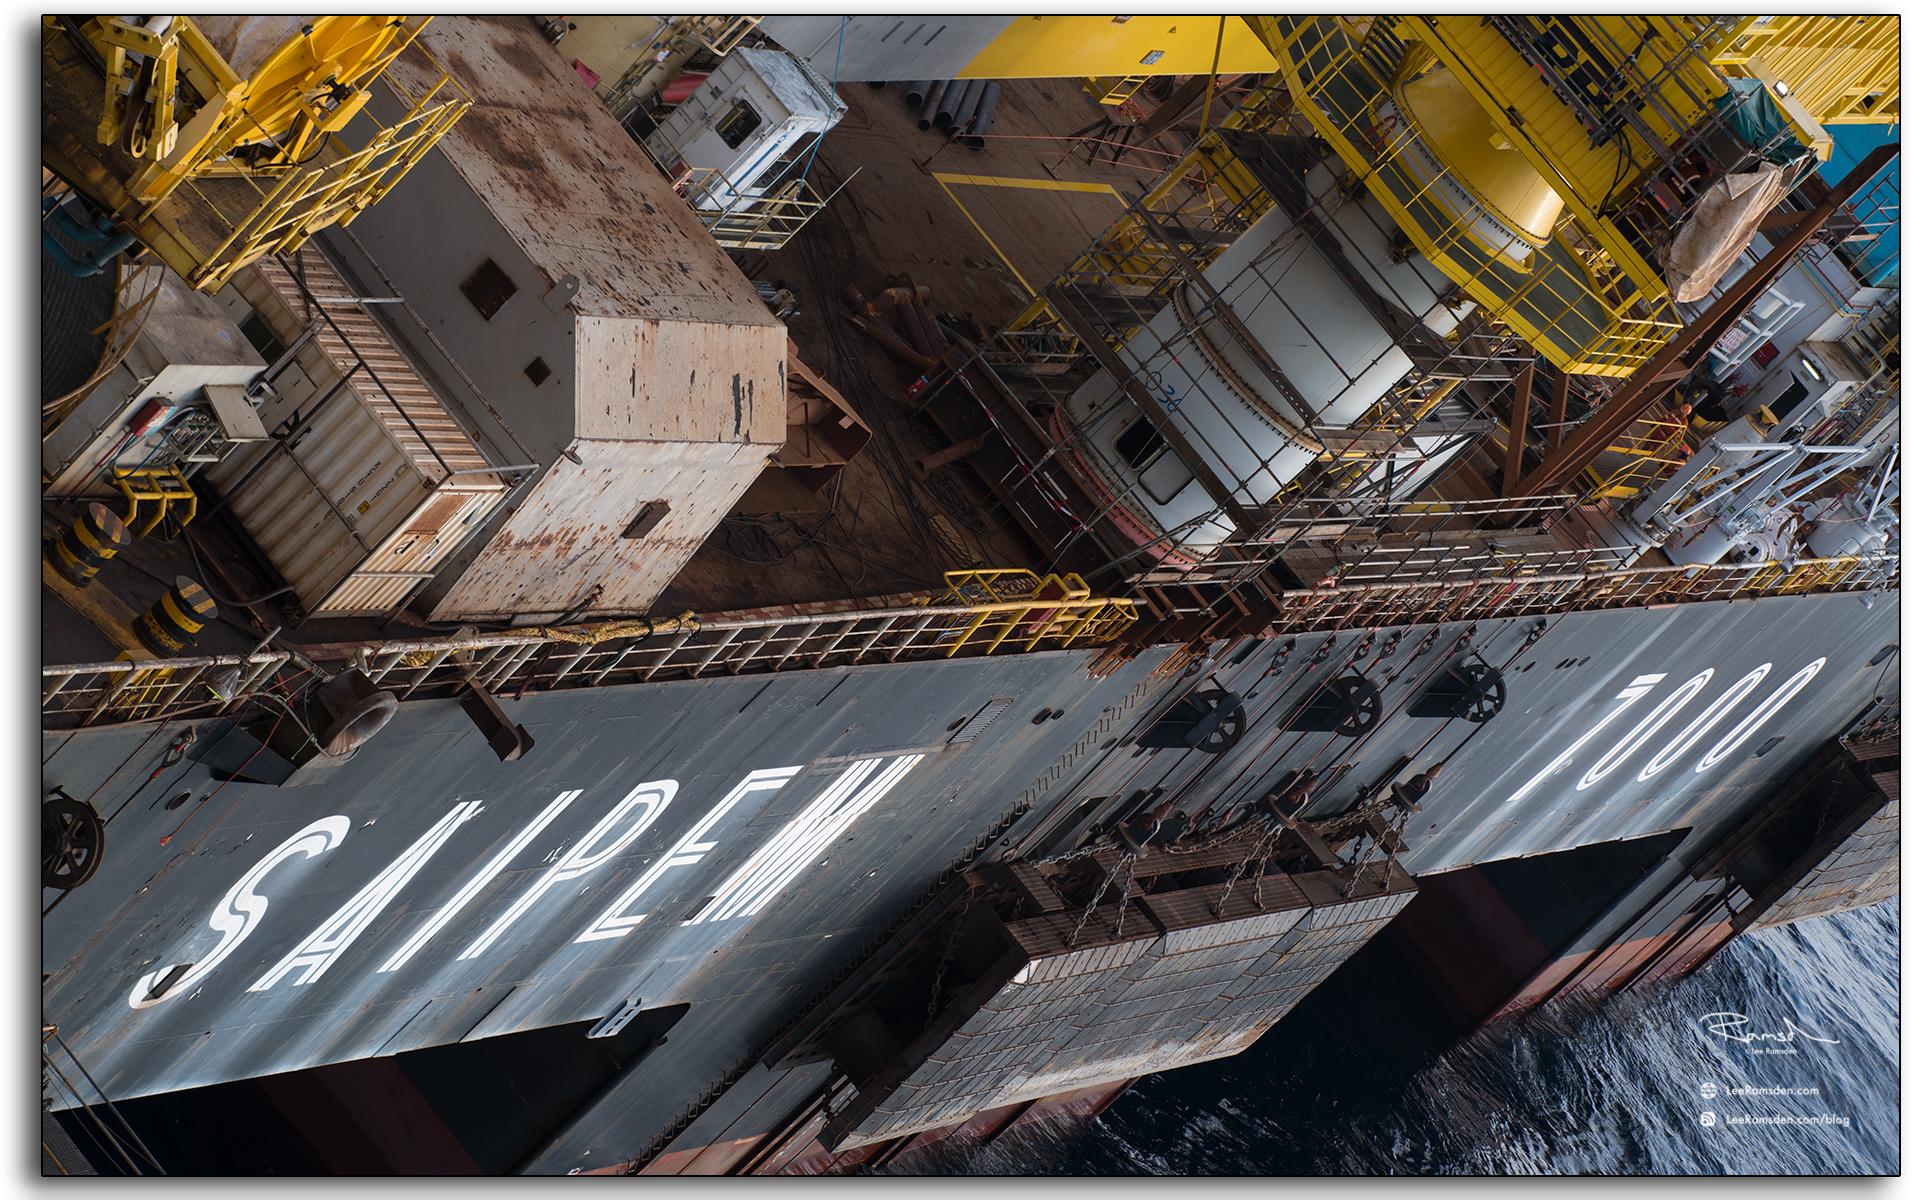 Saipem, 7000, industrial, oil and gas, crane